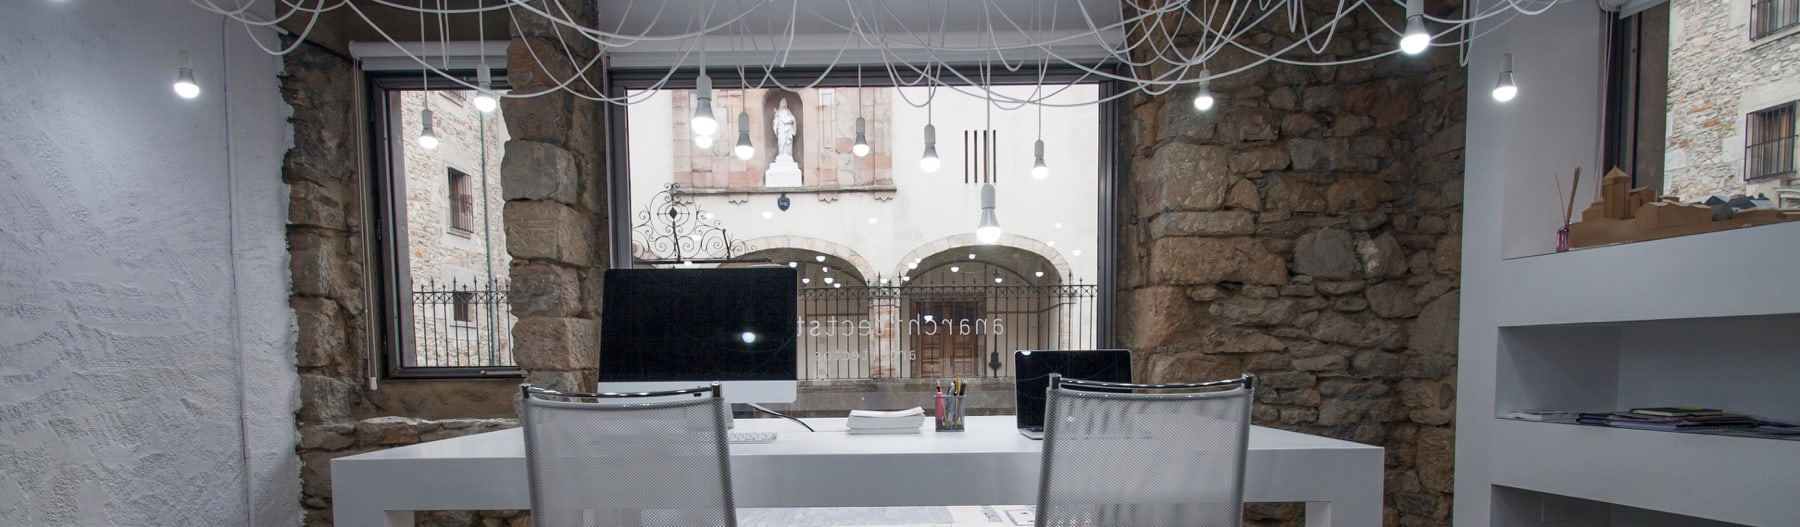 Centro De Fisioterapia Leire Urien De Ramos Bilbao Architects Homify # Muebles Fisioterapia